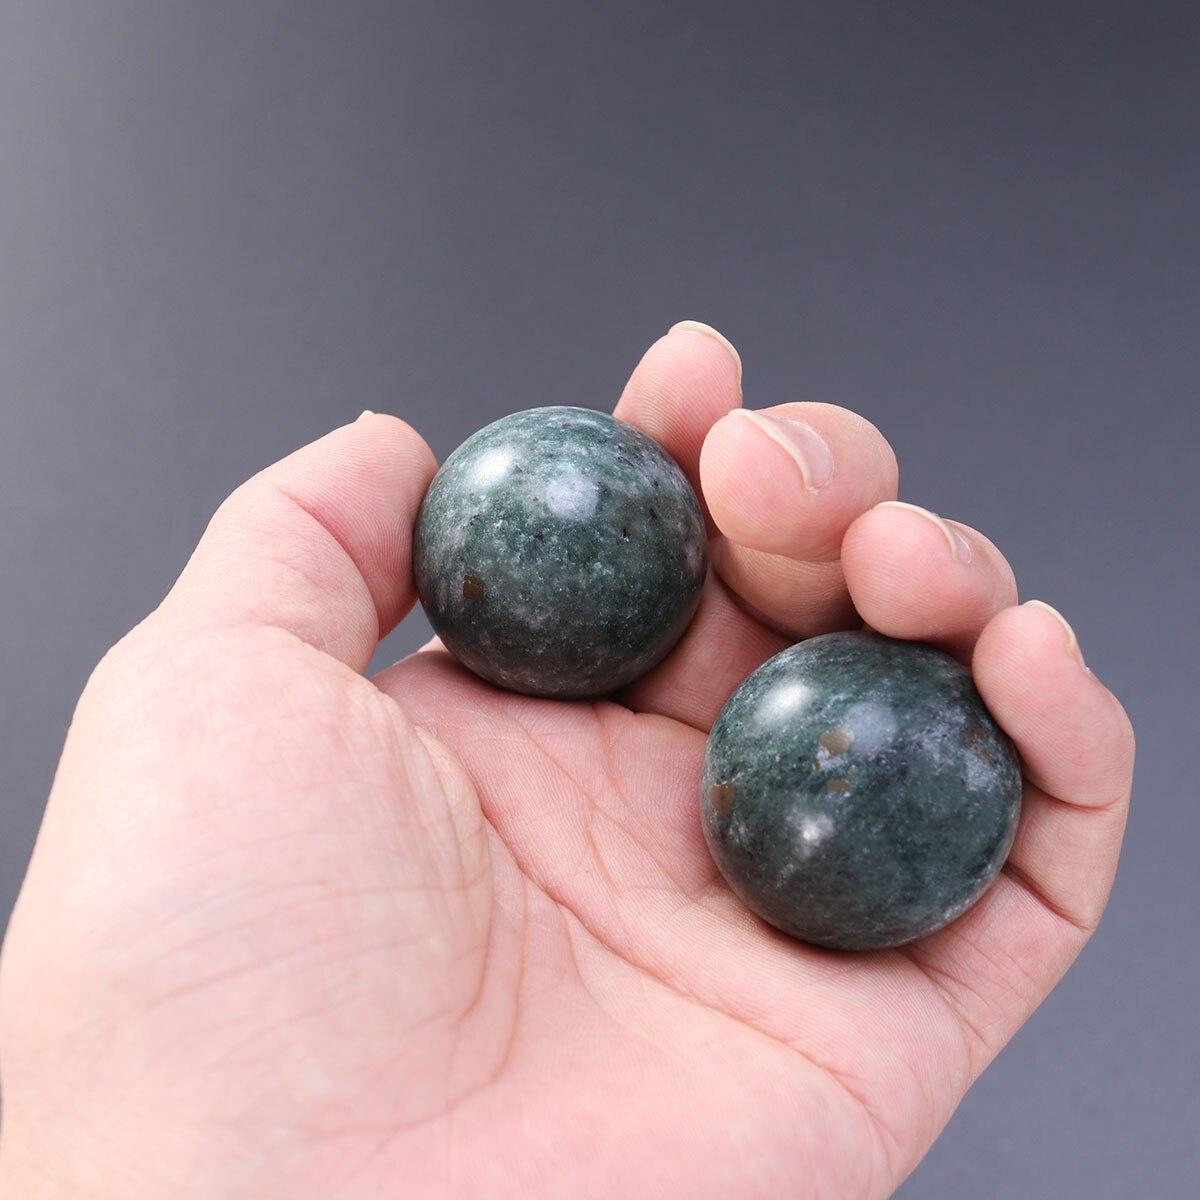 2 Pcs Massage Beautiful Ball Jade Health Care Ball Massage Jade Ball Exercise Jade Ball For Home Travel Outdoor